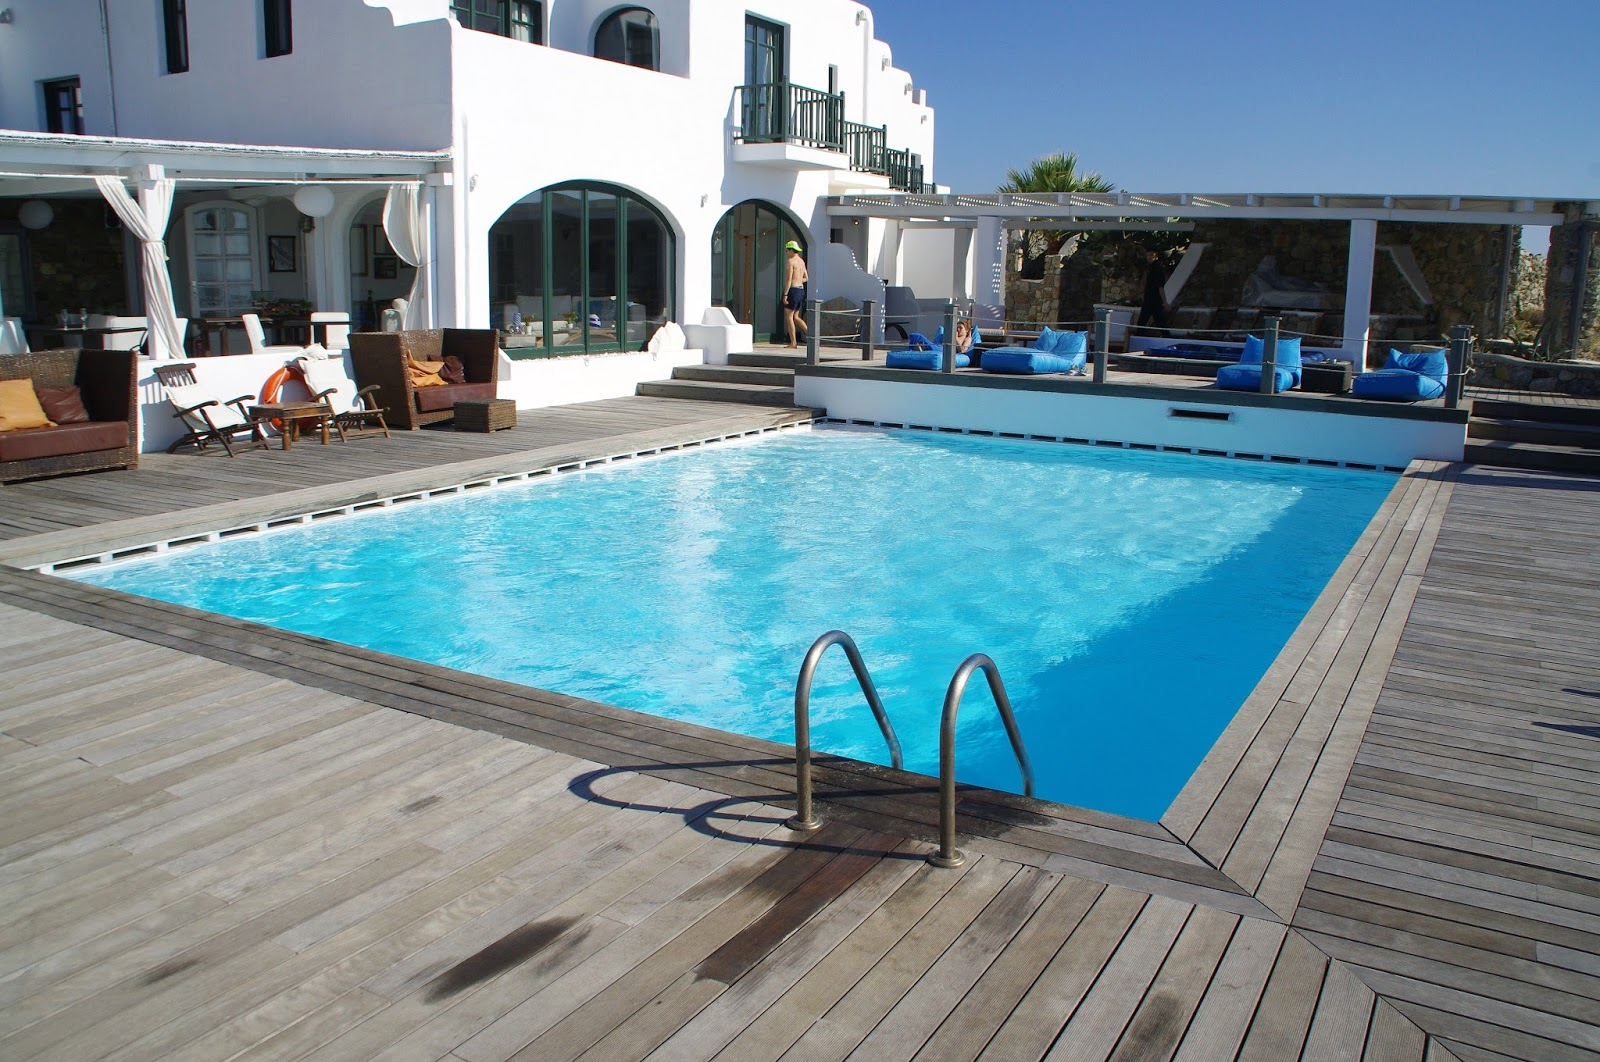 Tharroe of Mykonos Swimming Pool and Deck